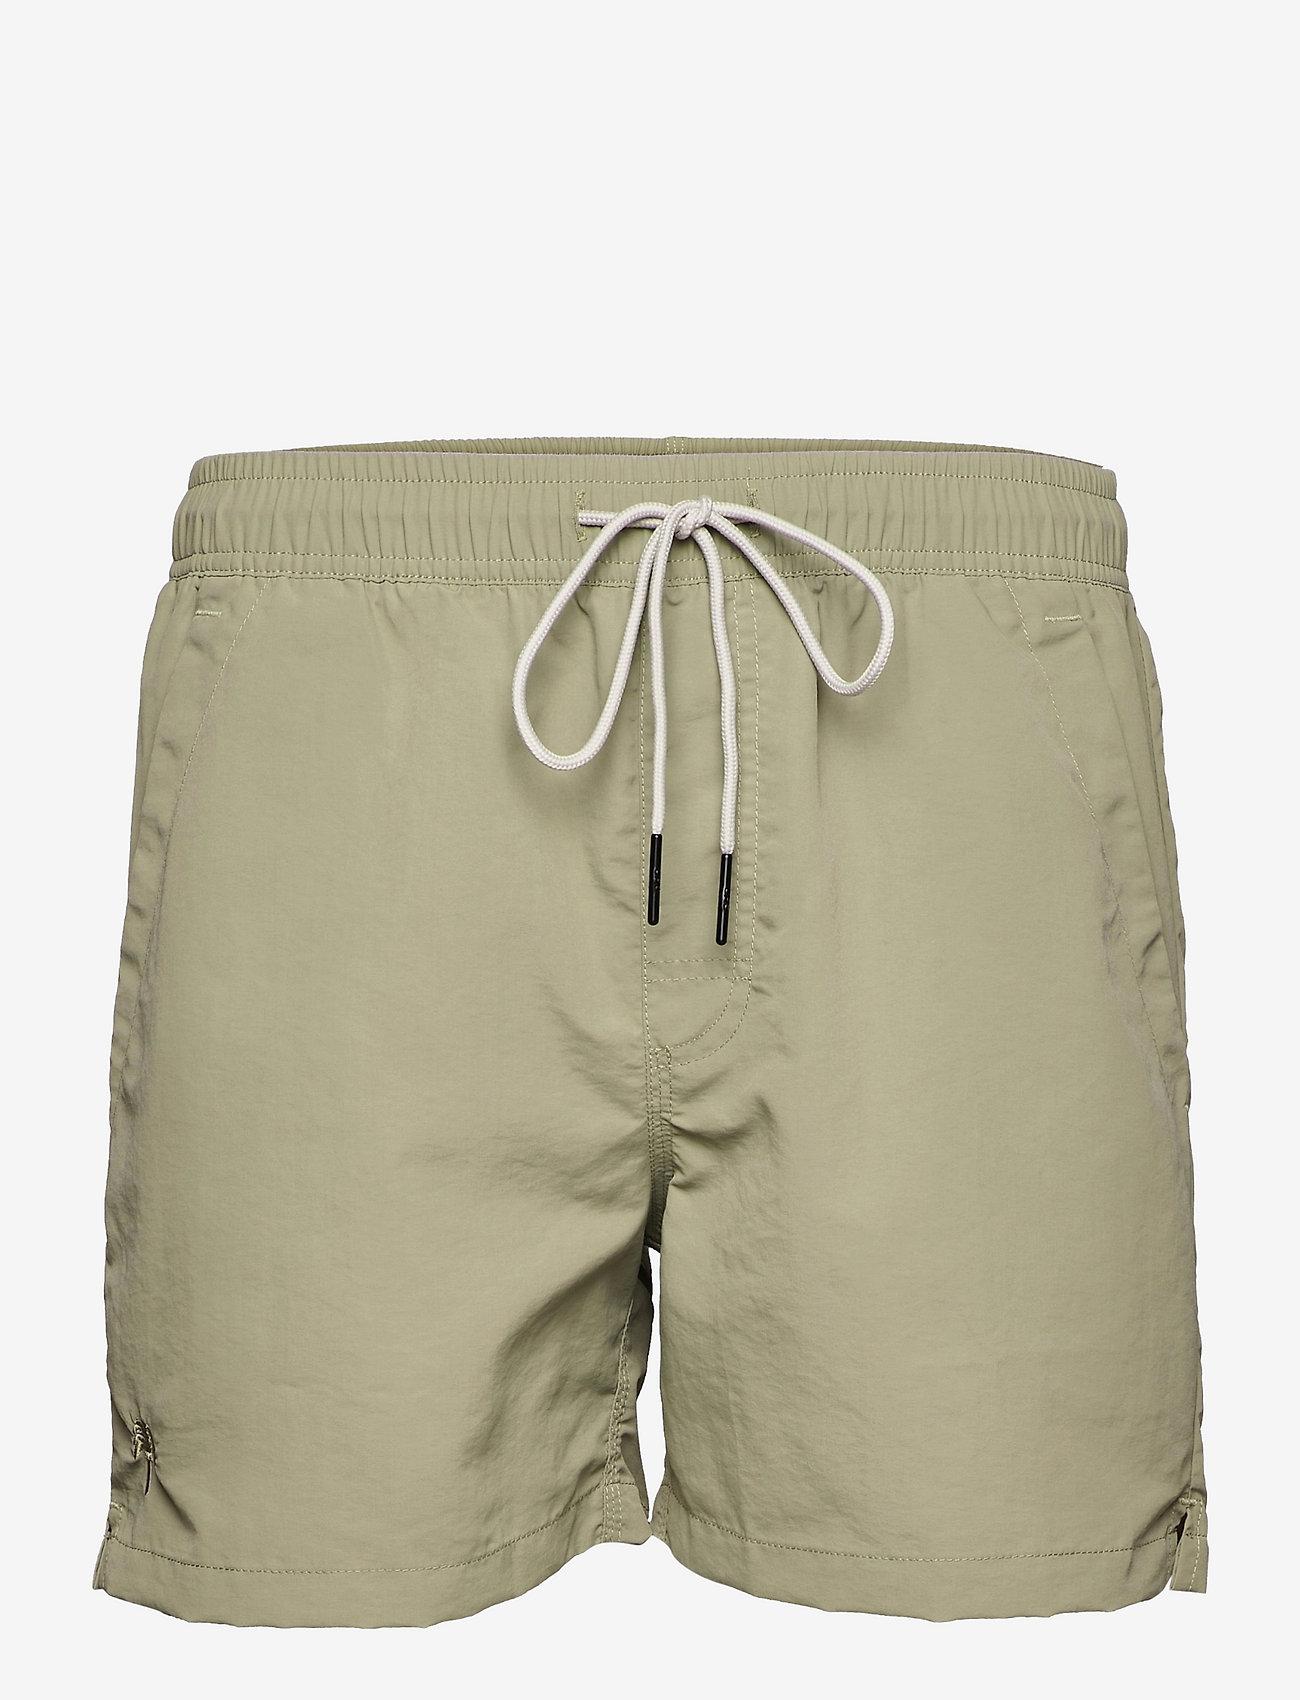 OAS - Green Nylon Swim Shorts - shorts - green - 0